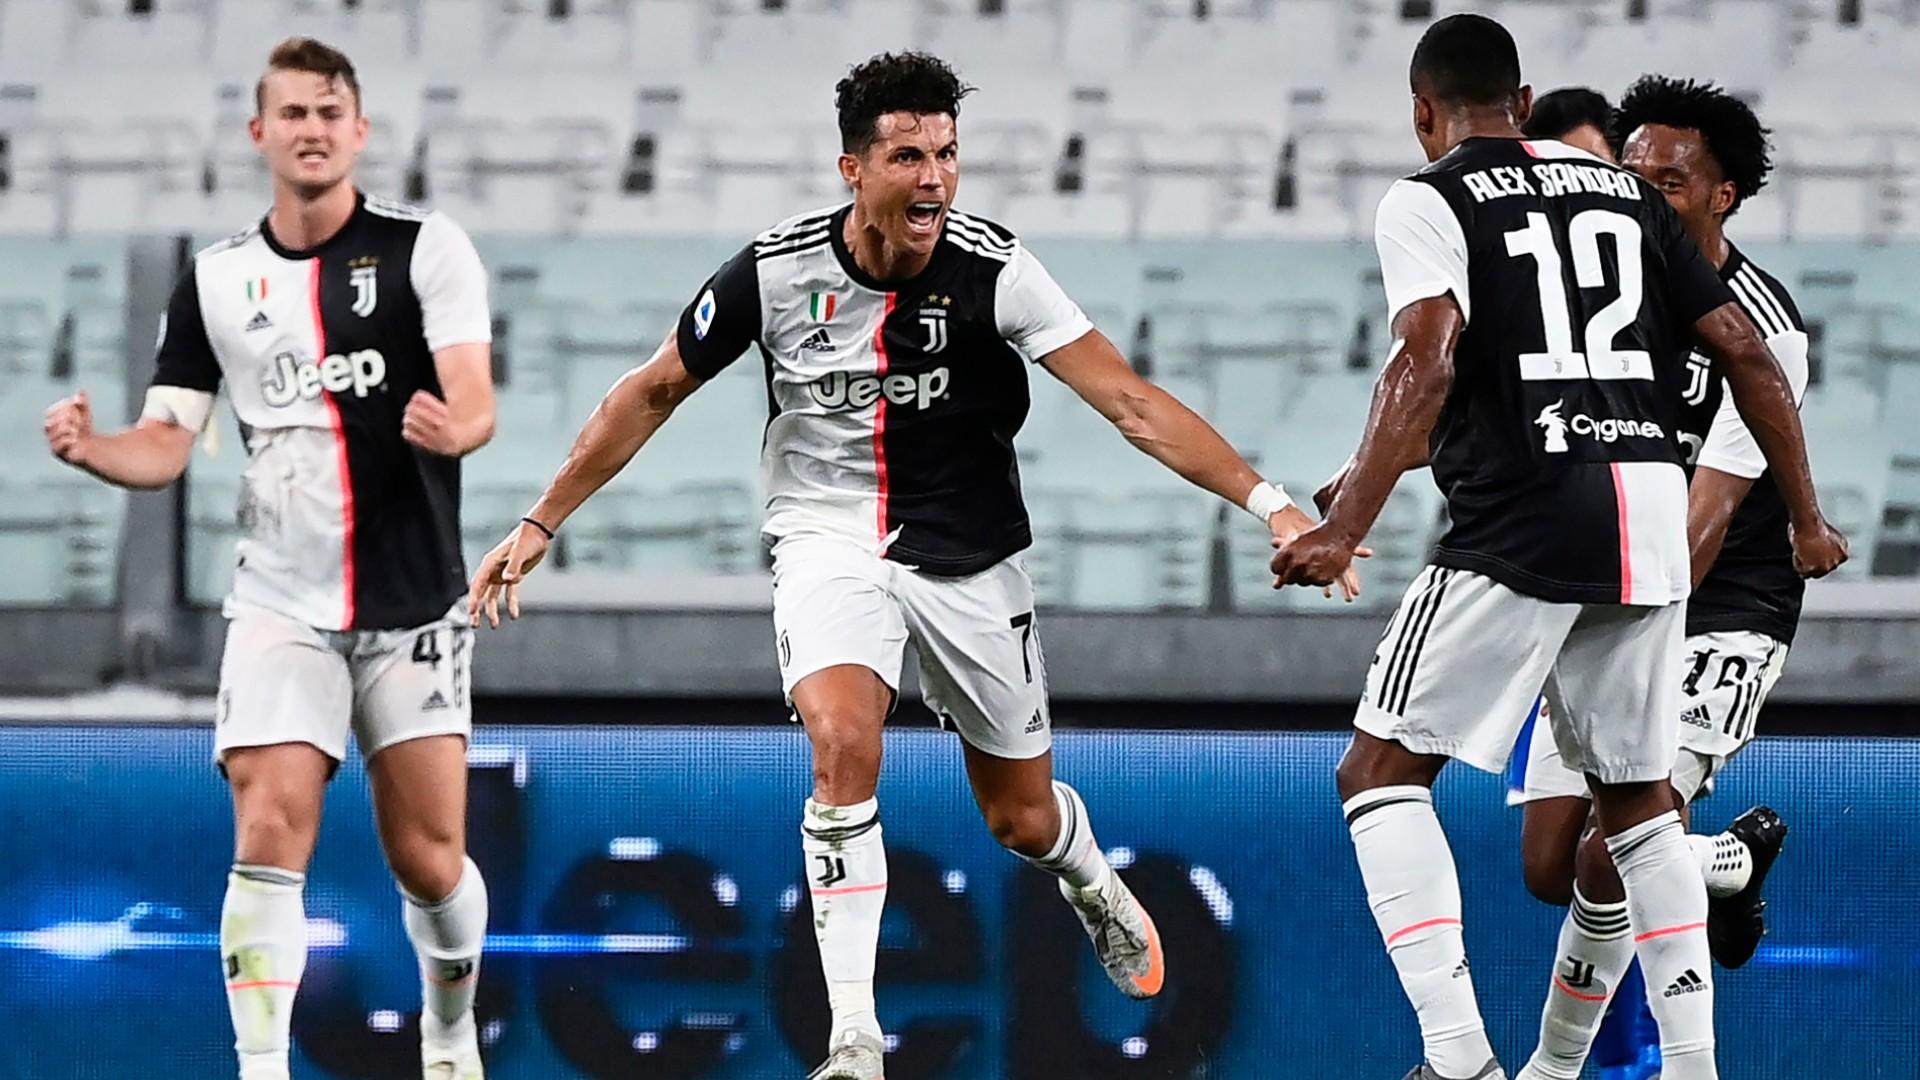 De Ligt and Juventus seal Serie A title